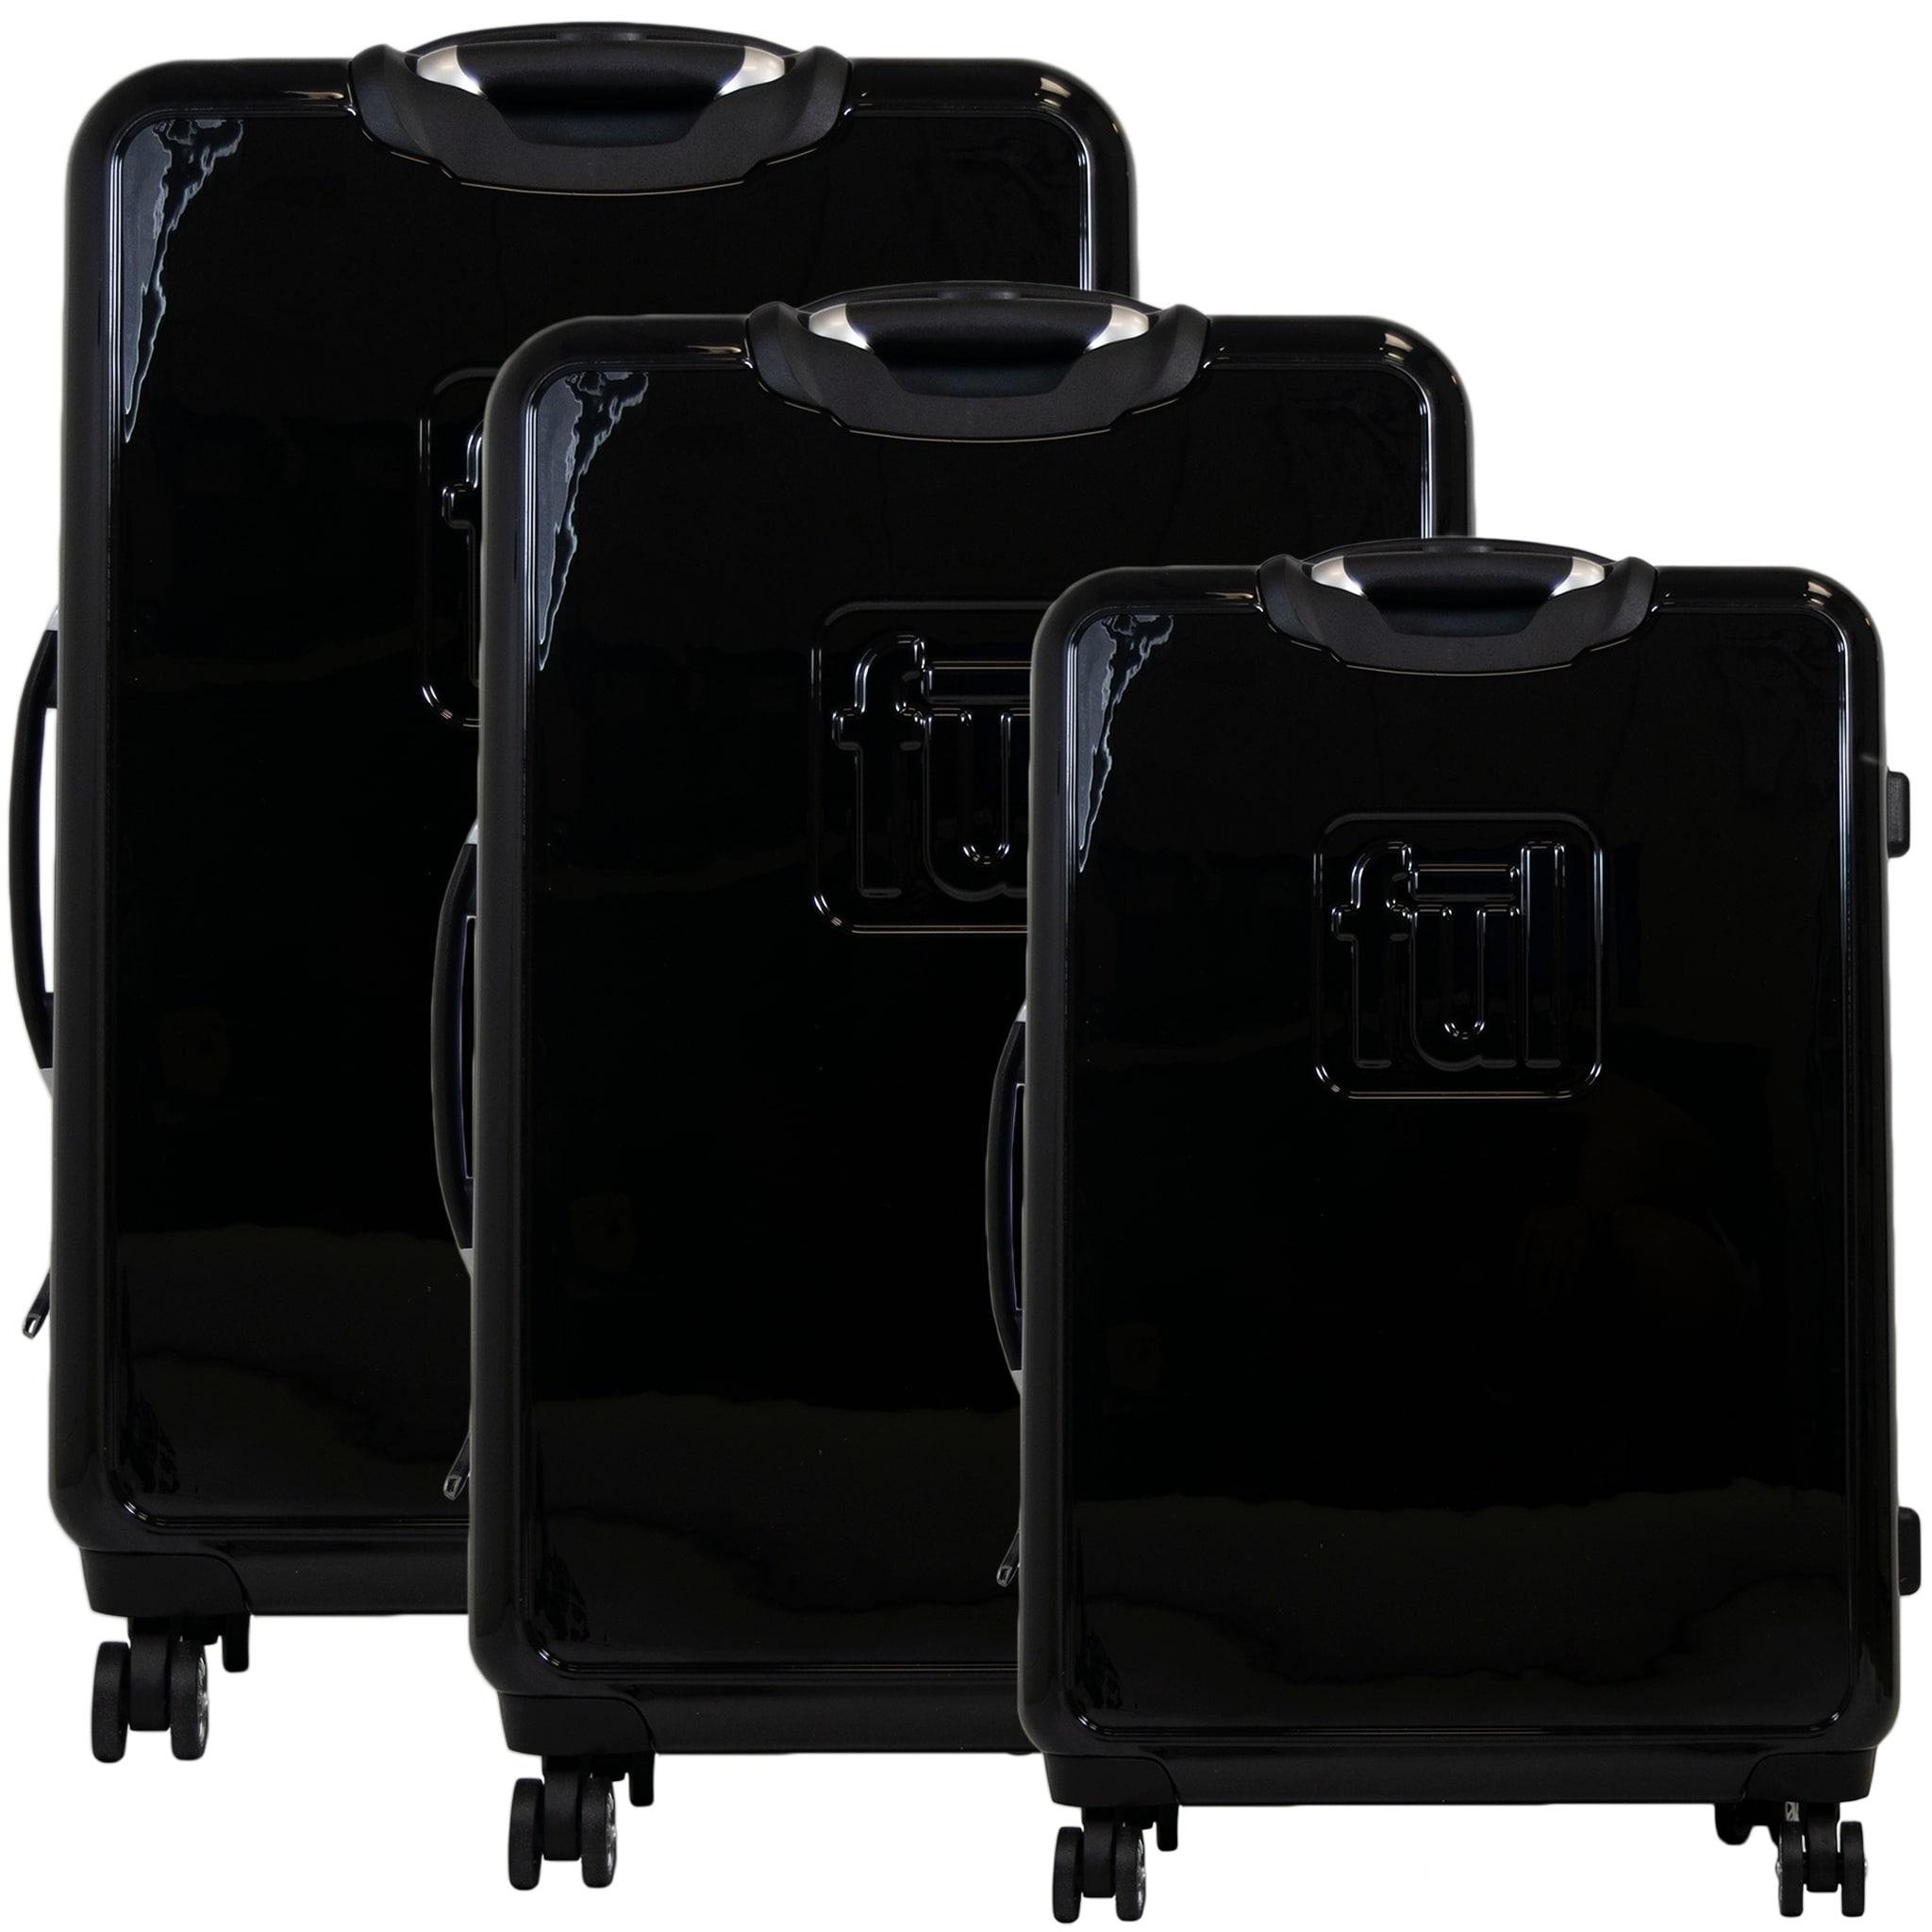 b6aad010d Shop Ful Printed Rose Hard Sided 3 Piece Luggage Set, Black - 29